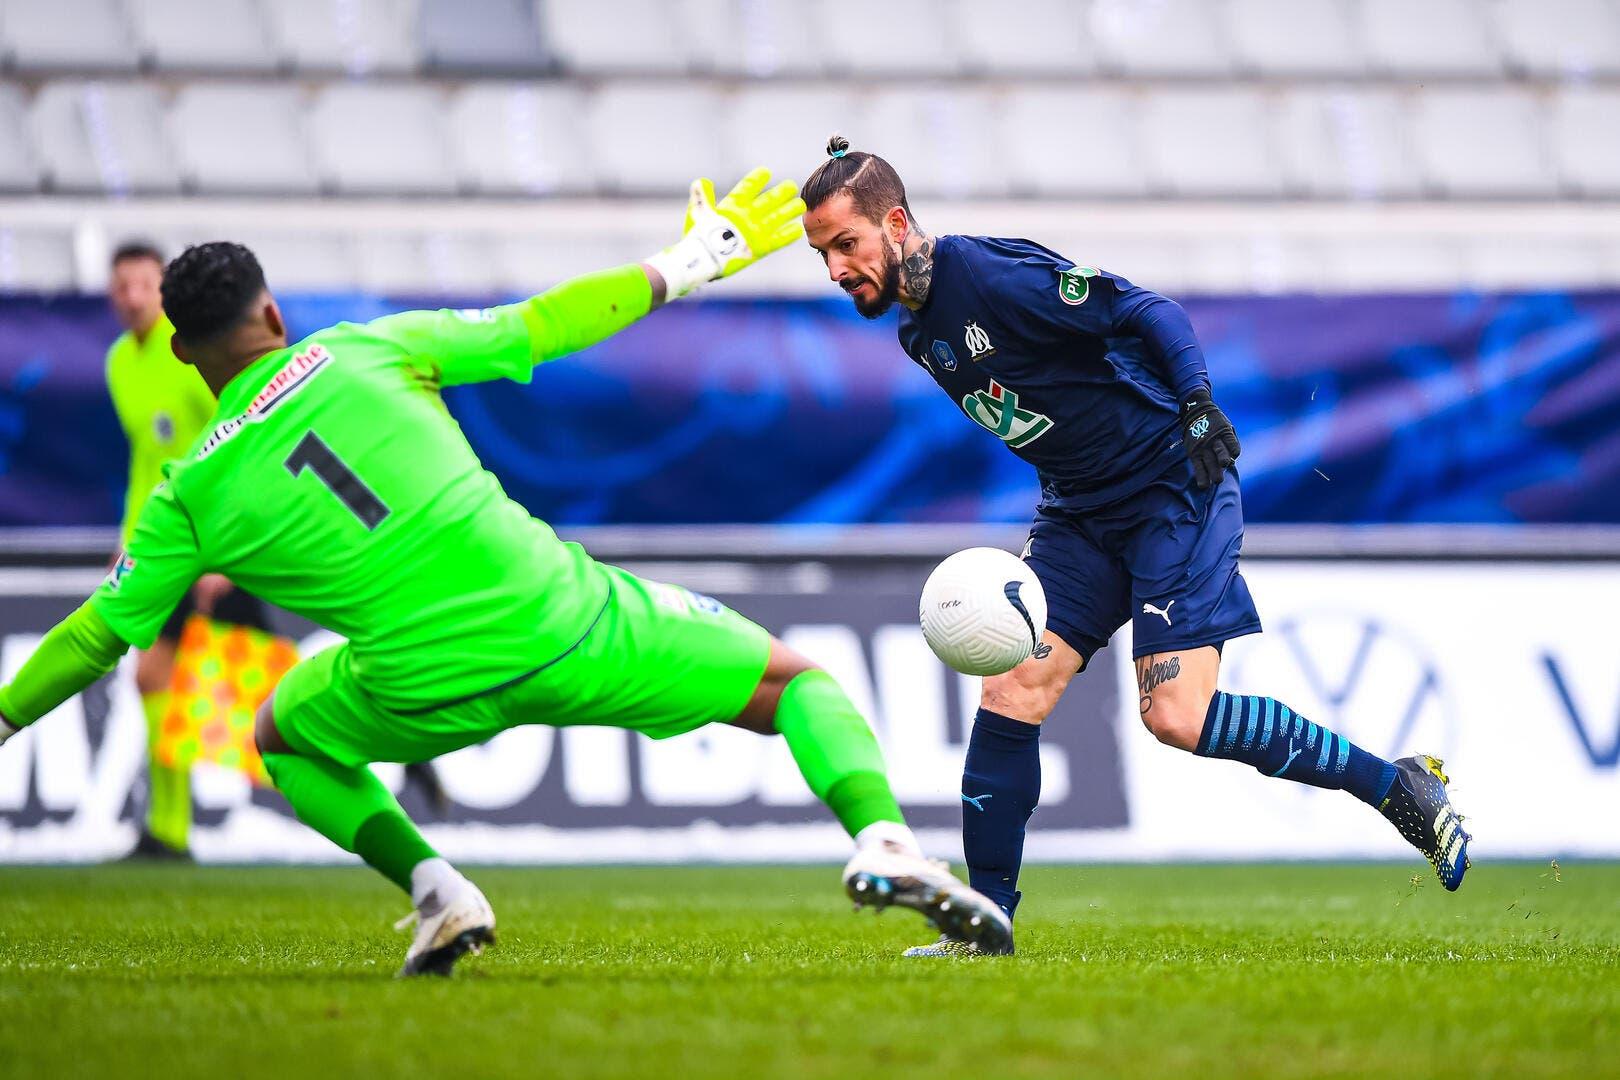 CdF : L'OM et Monaco passent, Bordeaux et Nantes tombent - Foot01.com